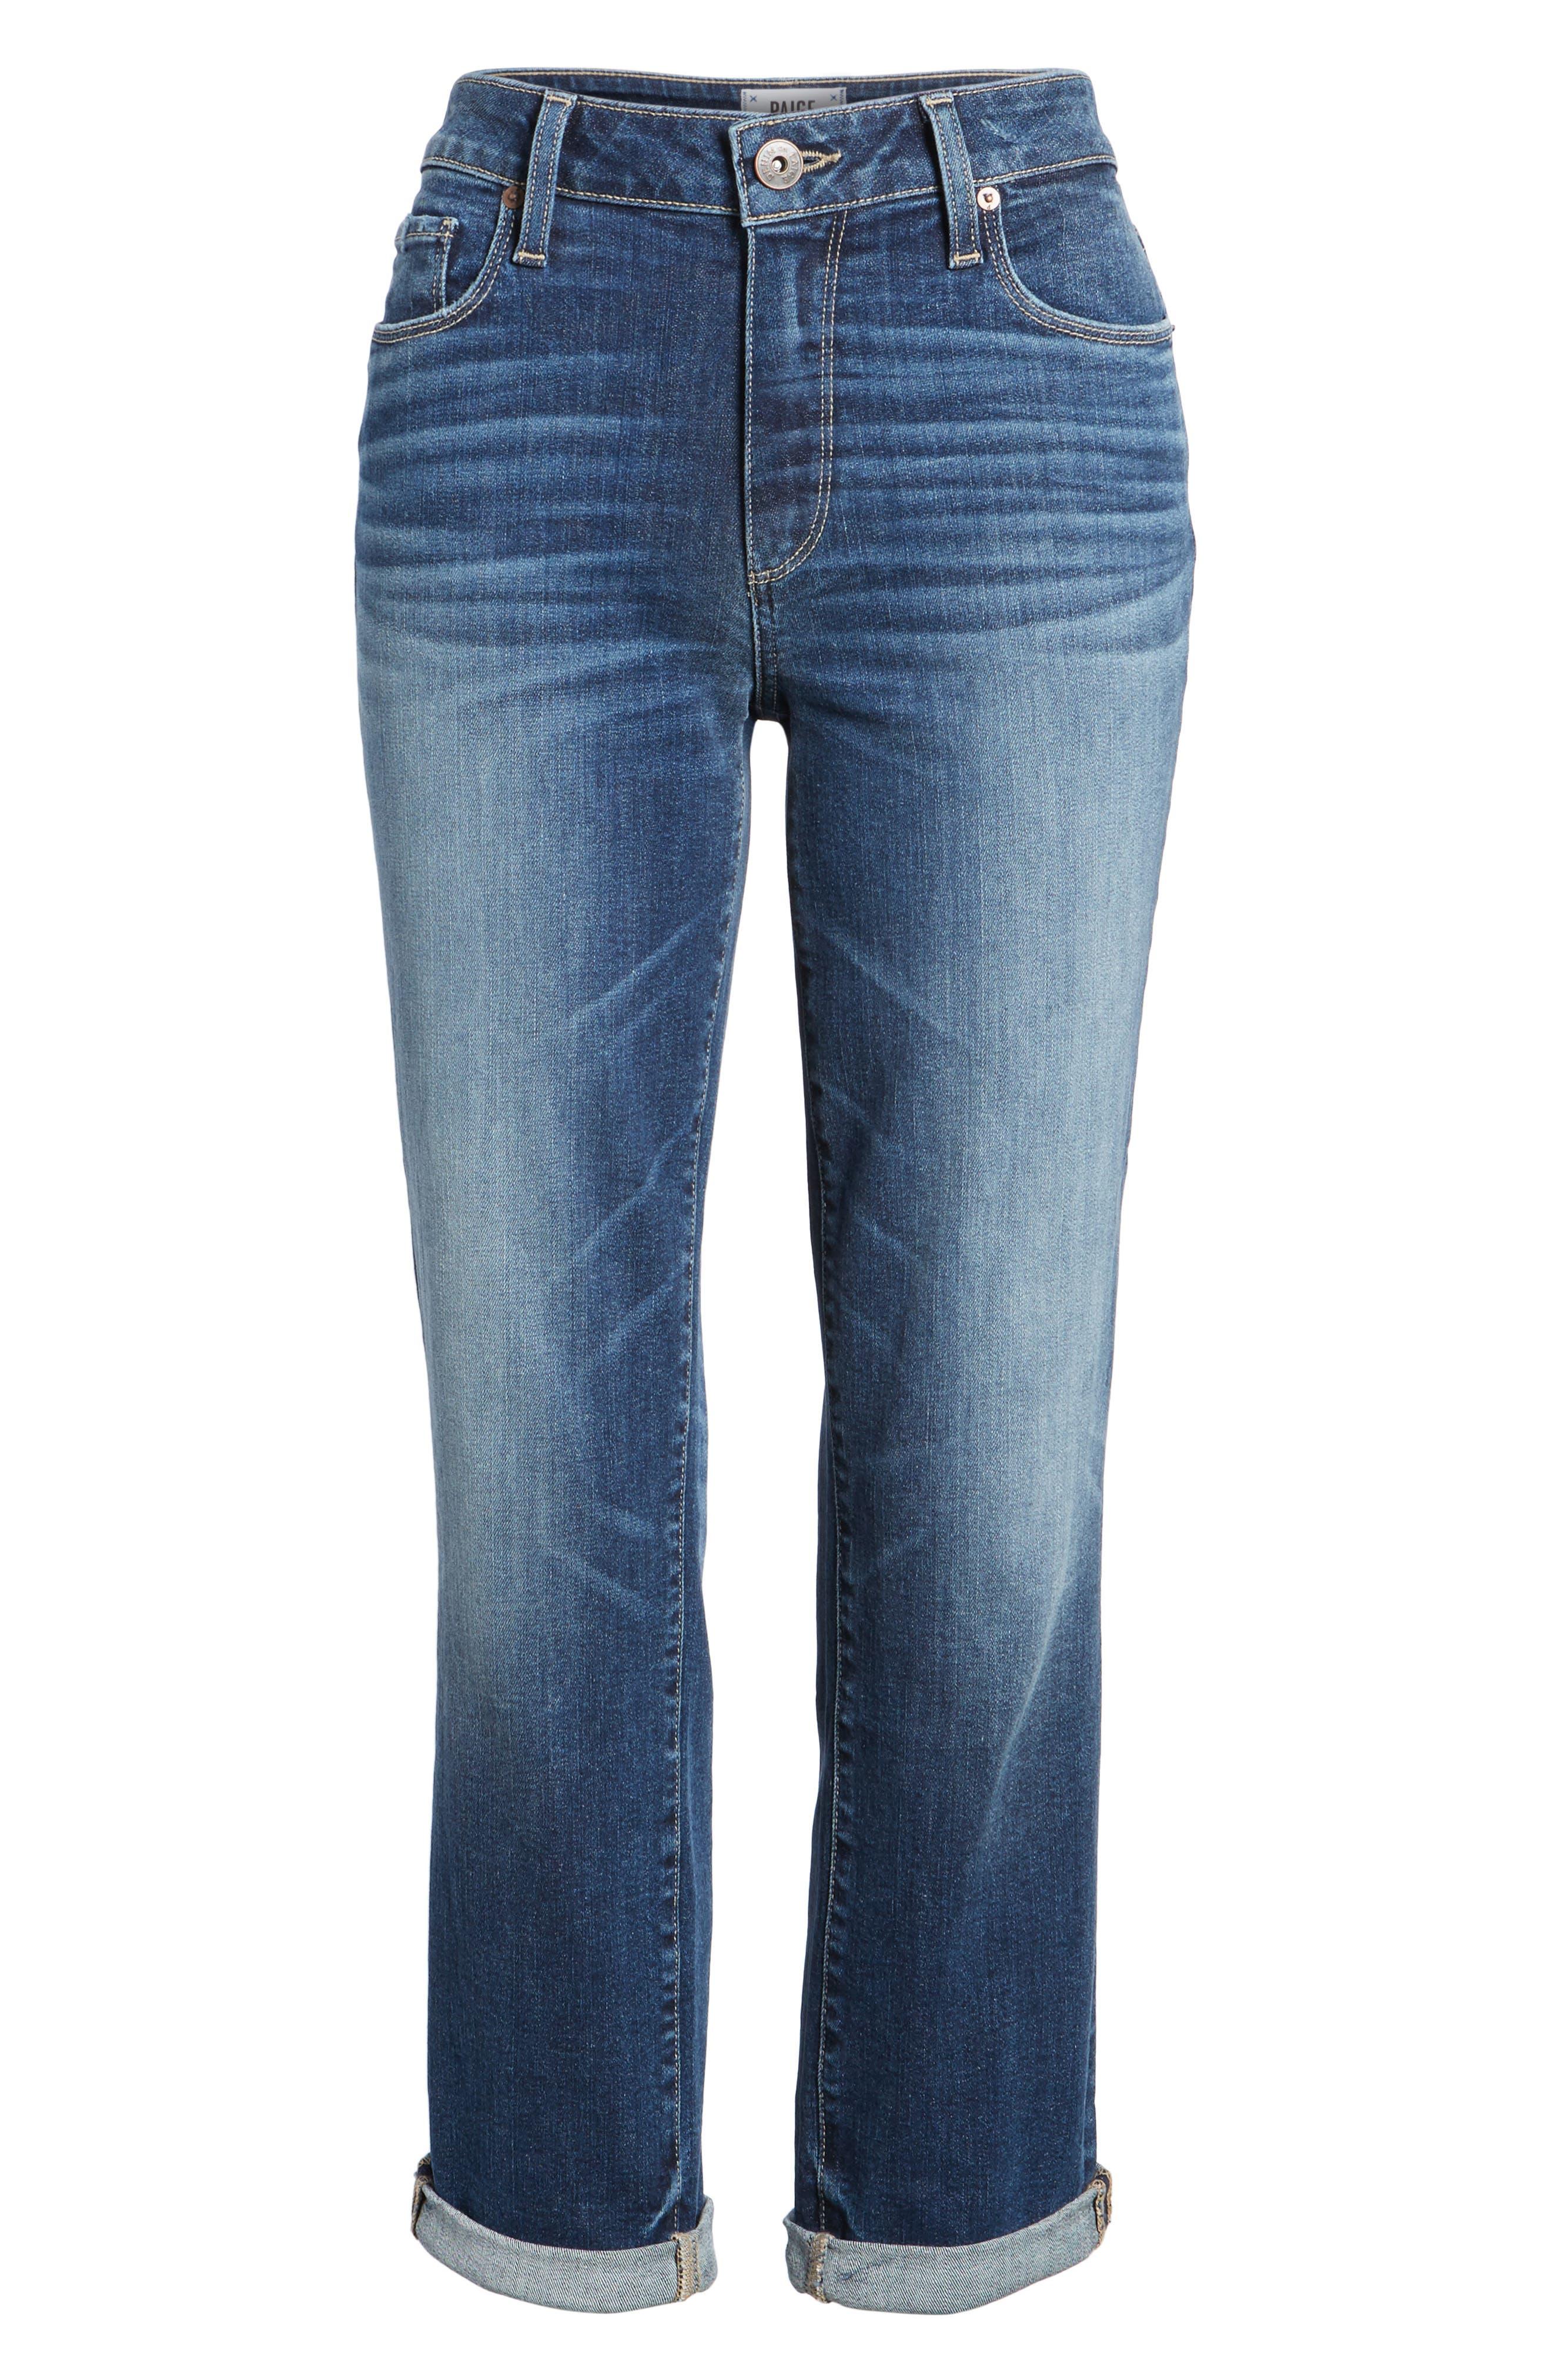 Jimmy Jimmy High Waist Crop Boyfriend Jeans,                             Alternate thumbnail 7, color,                             Blue